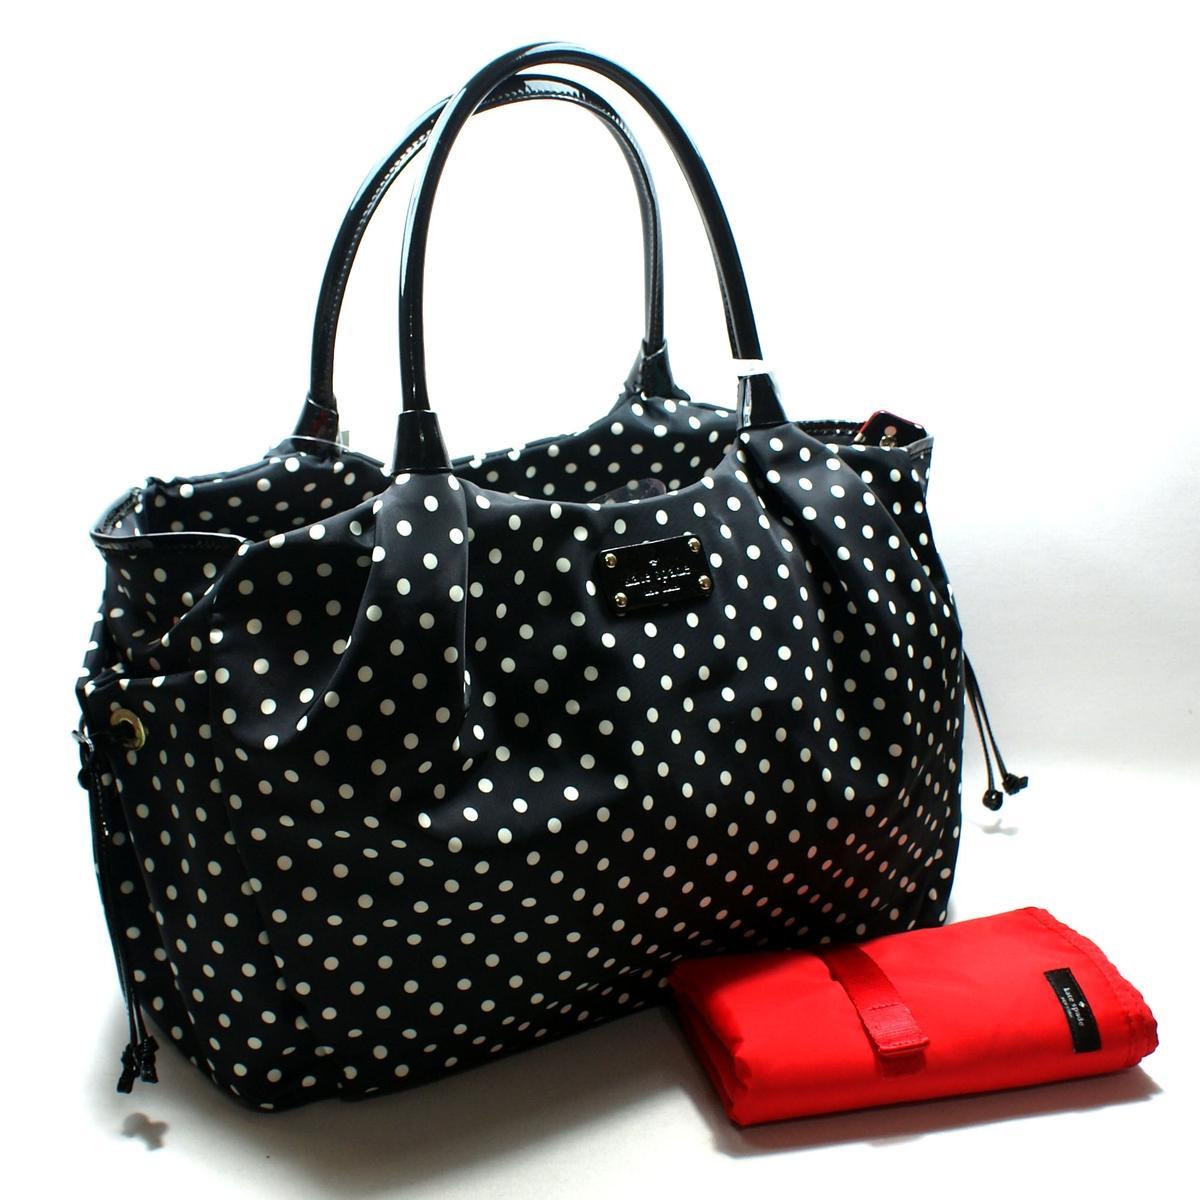 photos bild galeria kate spade diaper bag. Black Bedroom Furniture Sets. Home Design Ideas